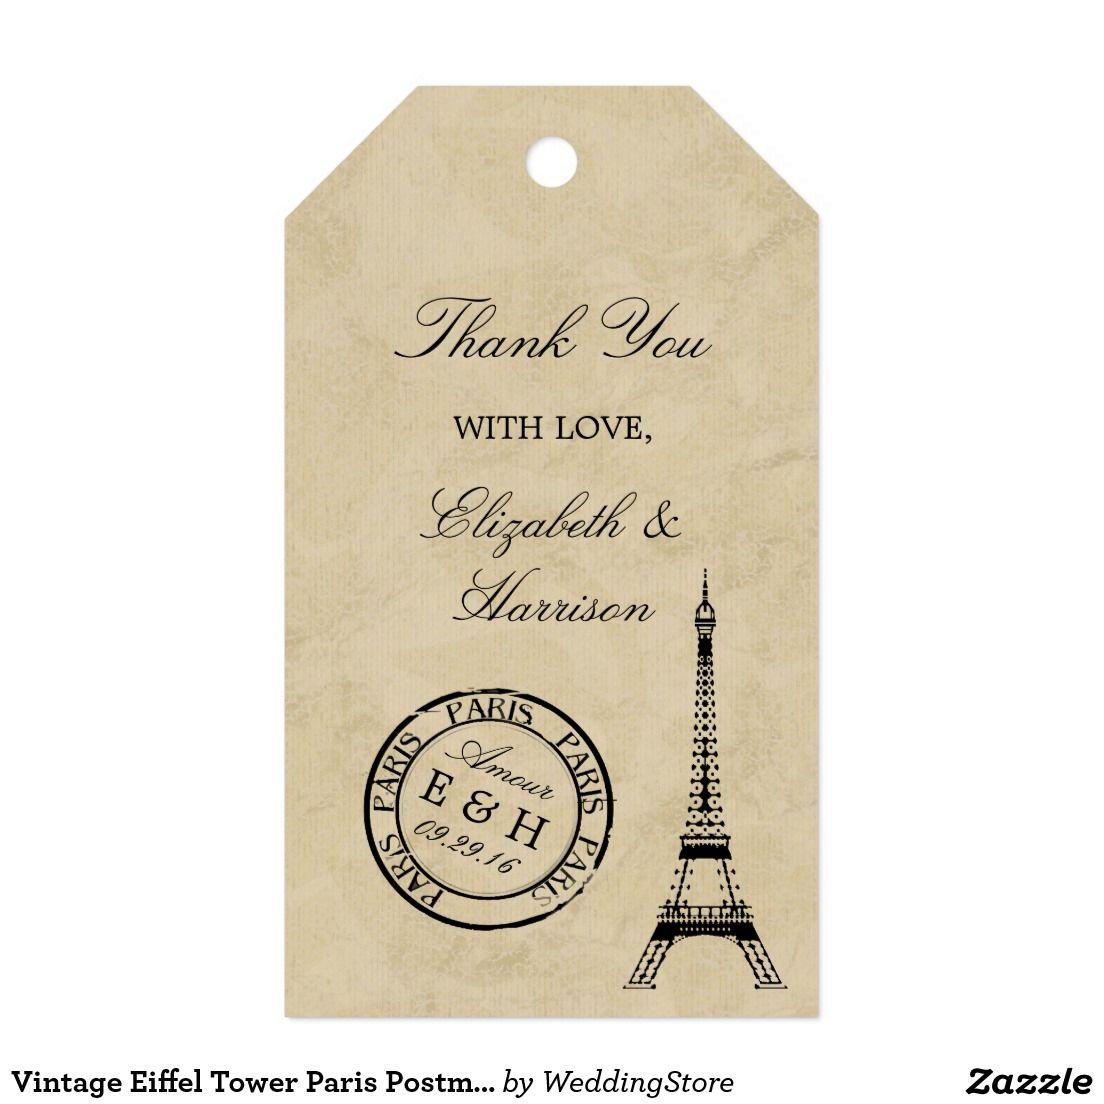 Vintage Eiffel Tower Paris Postmark Wedding Favor Gift Tags ...